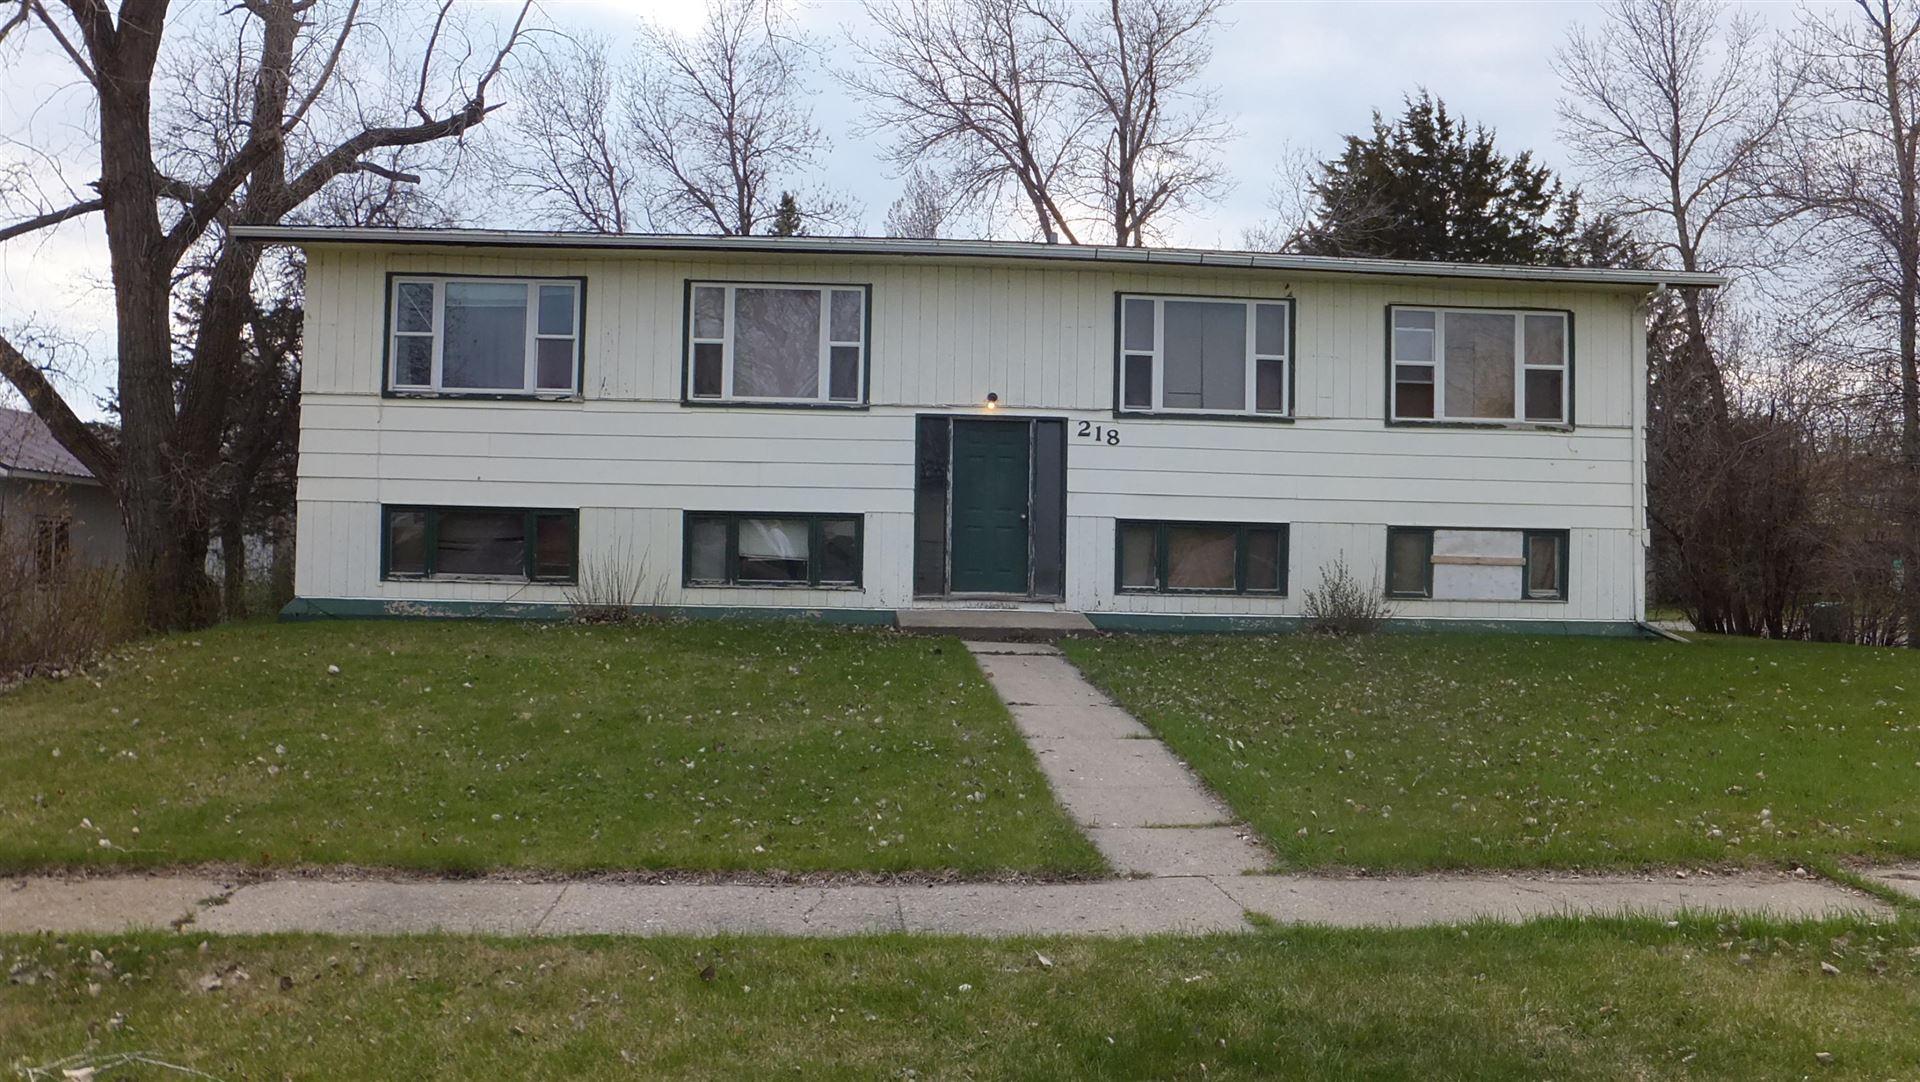 218 Lakota Avenue, Center, ND 58530 - #: 406768